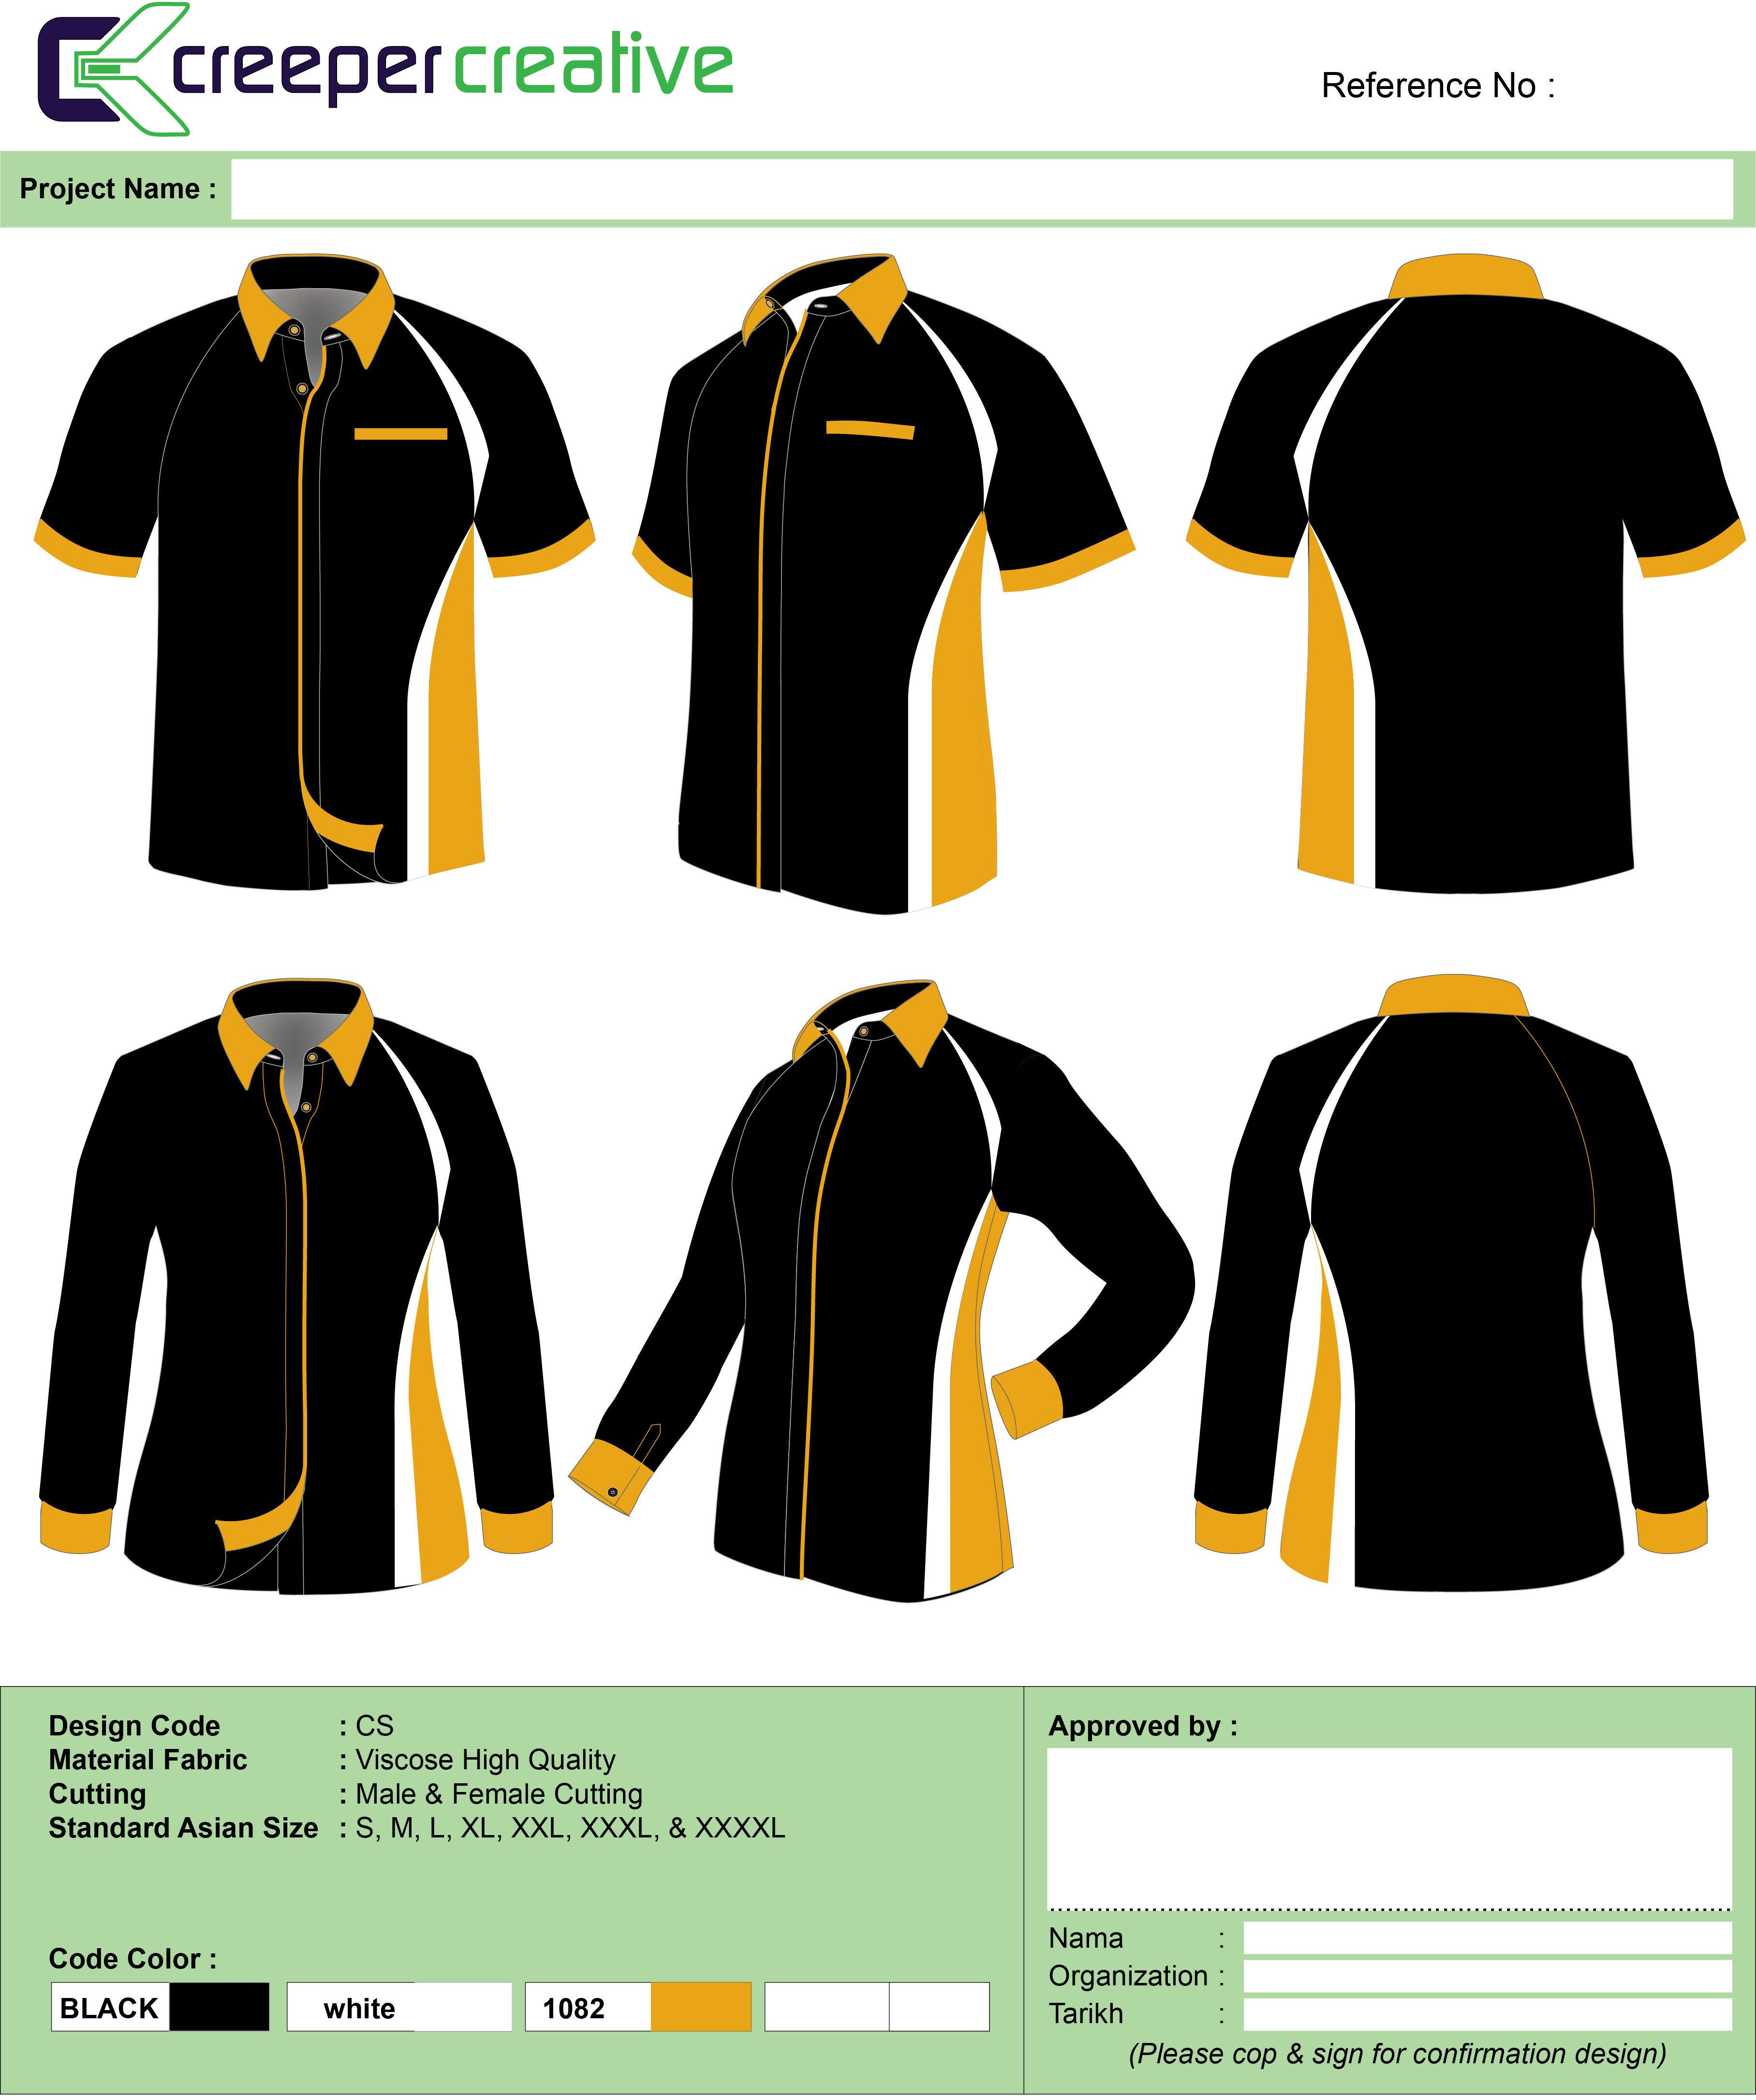 KST LAND SDN BHDpolouniform Custom Polo Shirts Printed Polo Shirts Uniform Design Corporate